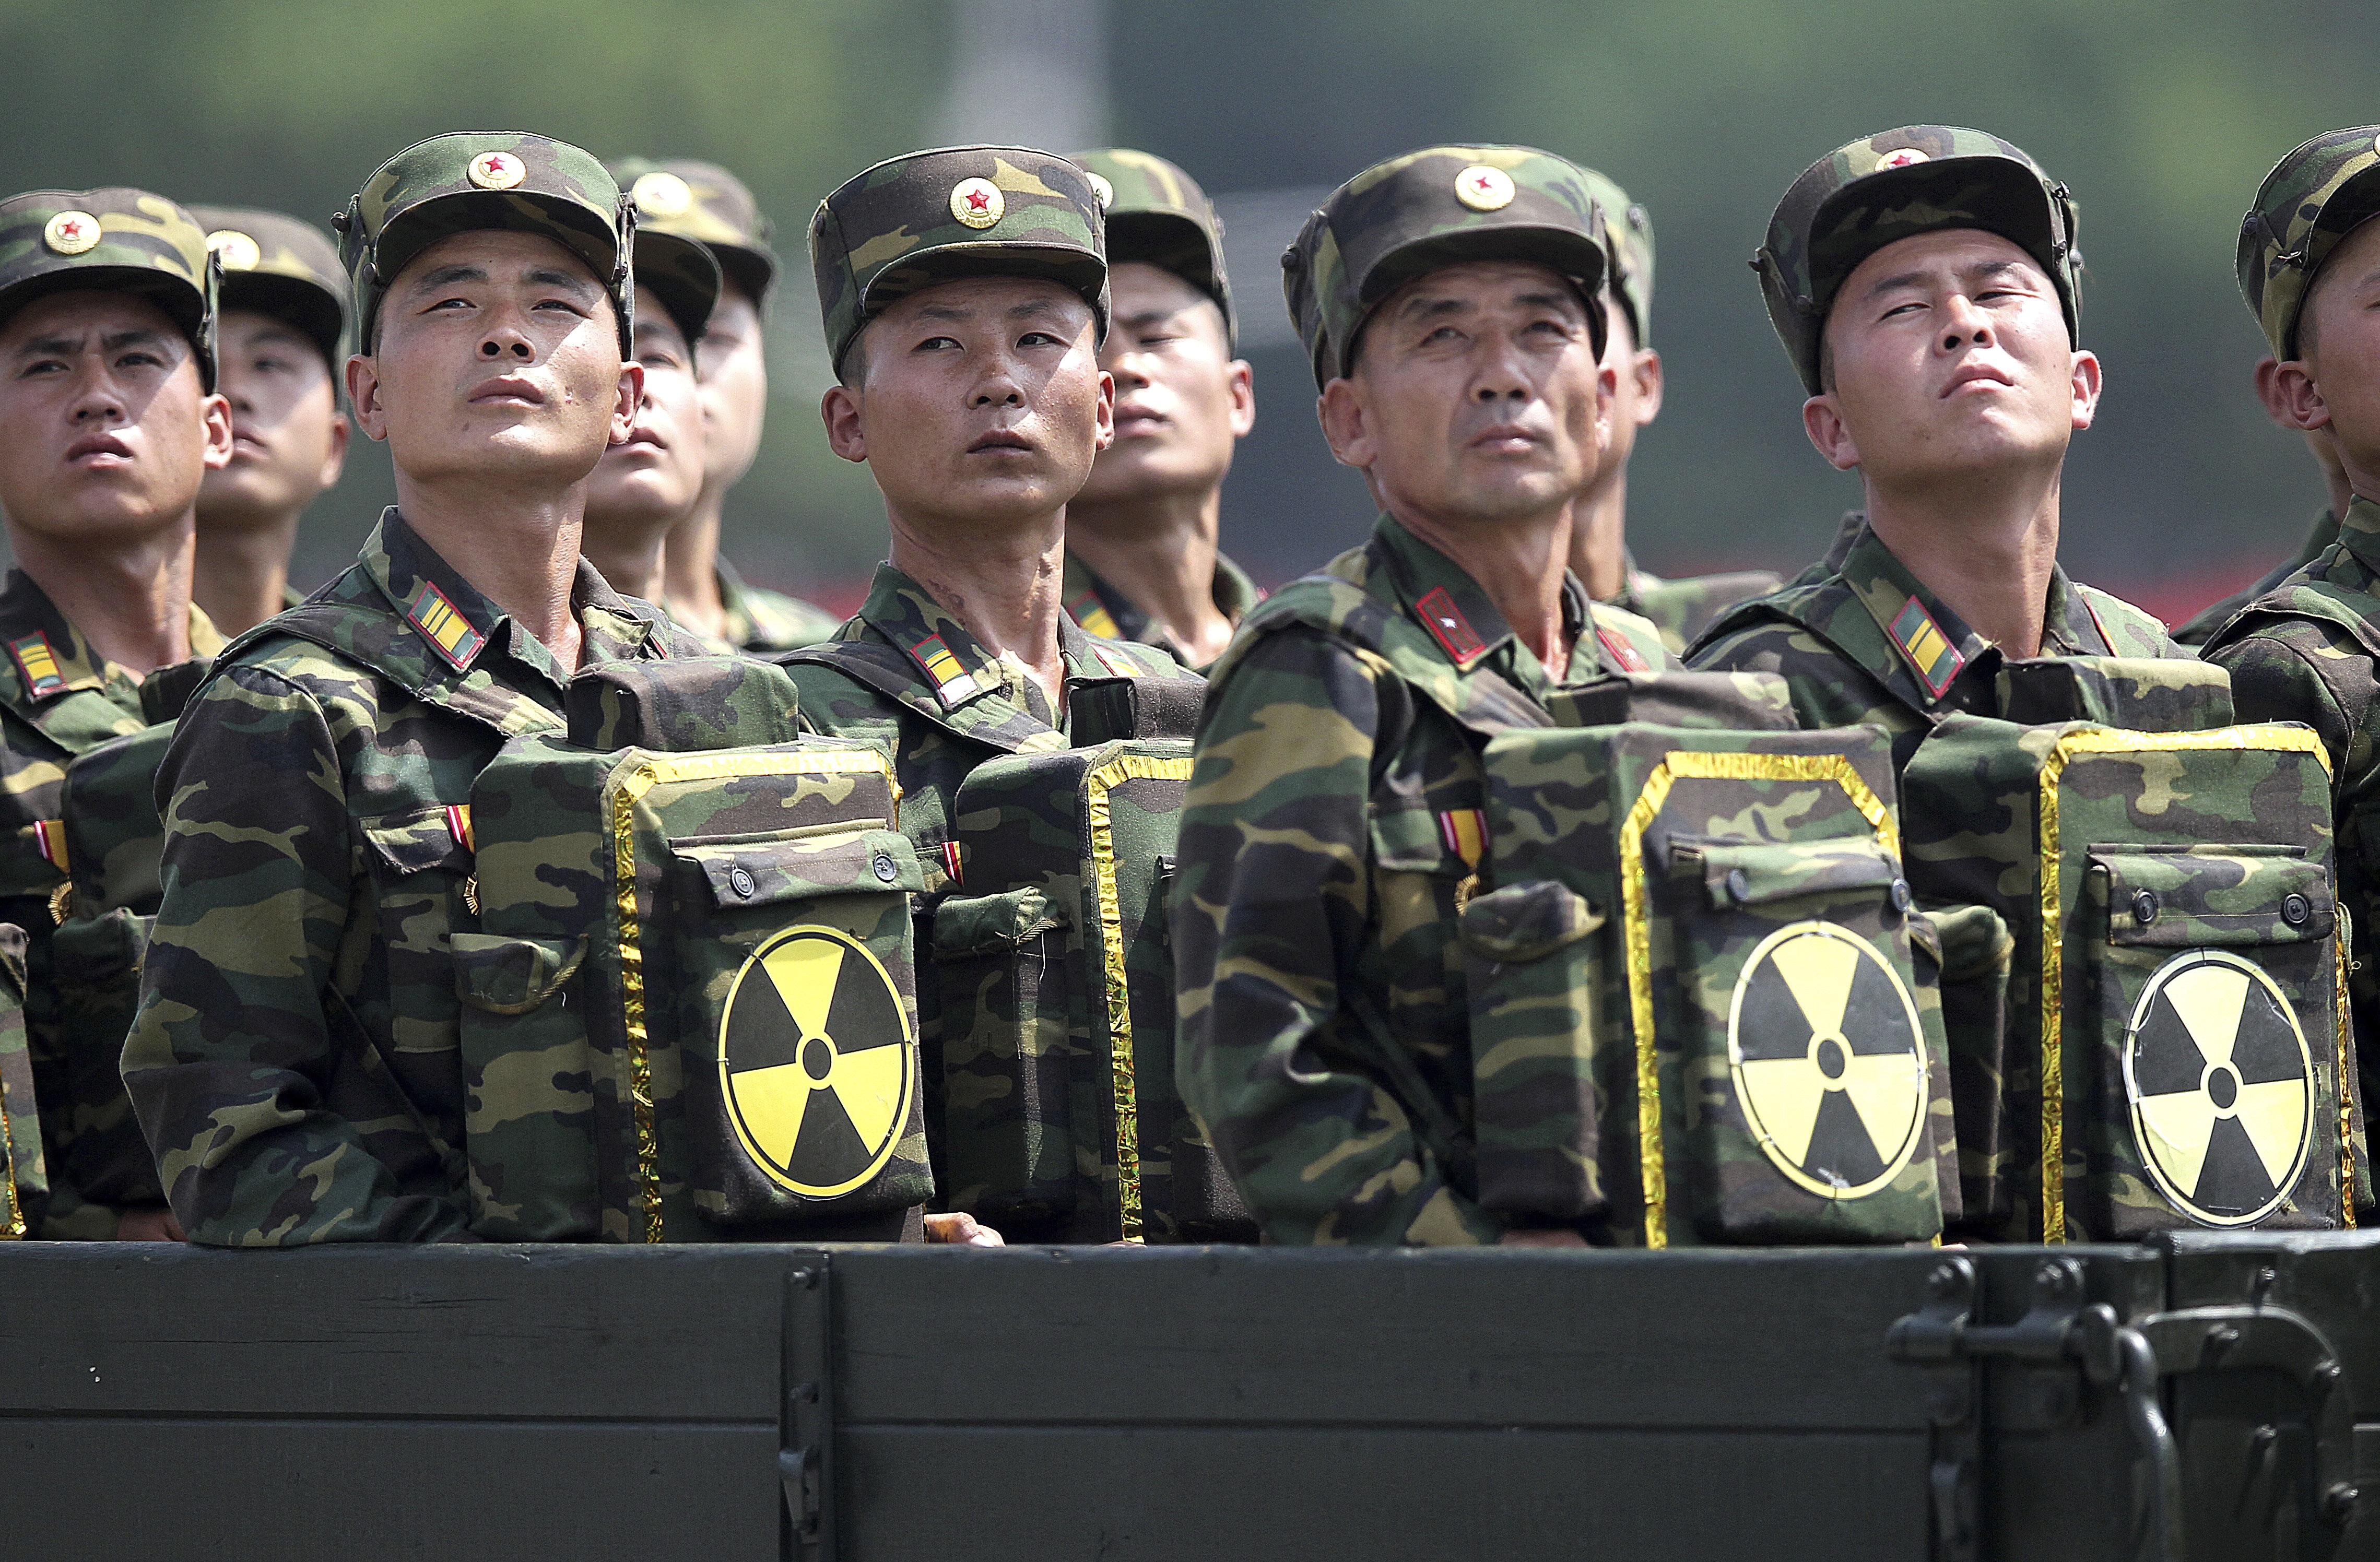 635926942854719111-North-Korea-Kim-s-Arm-Rafa.jpg